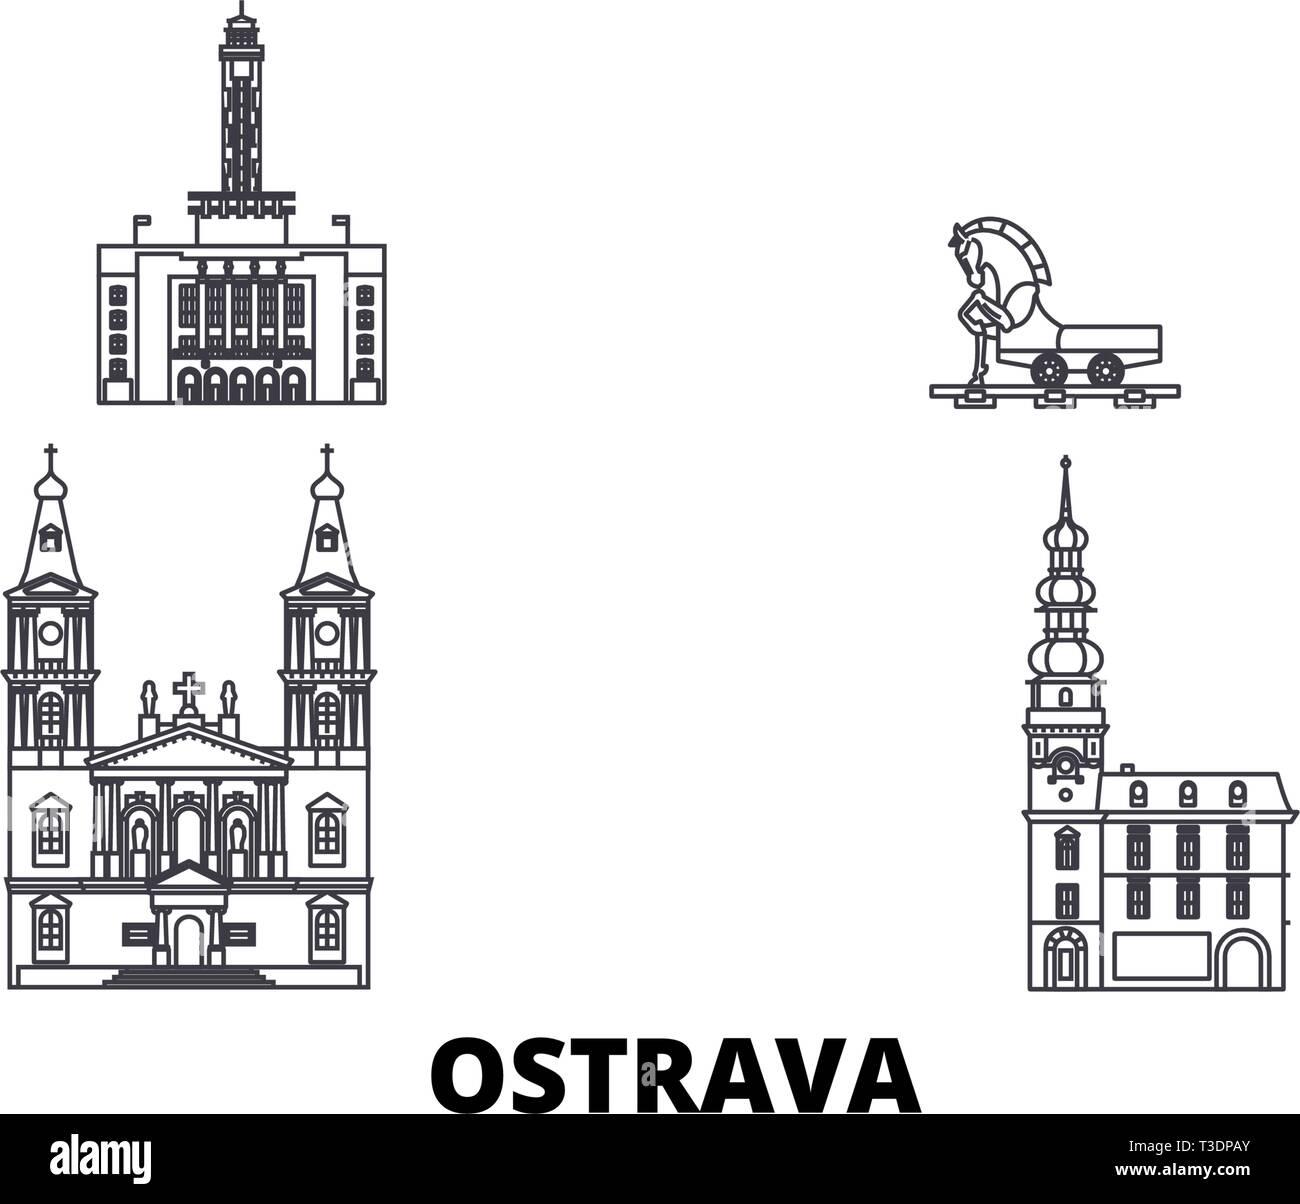 Czech Republic, Ostrava line travel skyline set. Czech Republic, Ostrava outline city vector illustration, symbol, travel sights, landmarks. - Stock Image